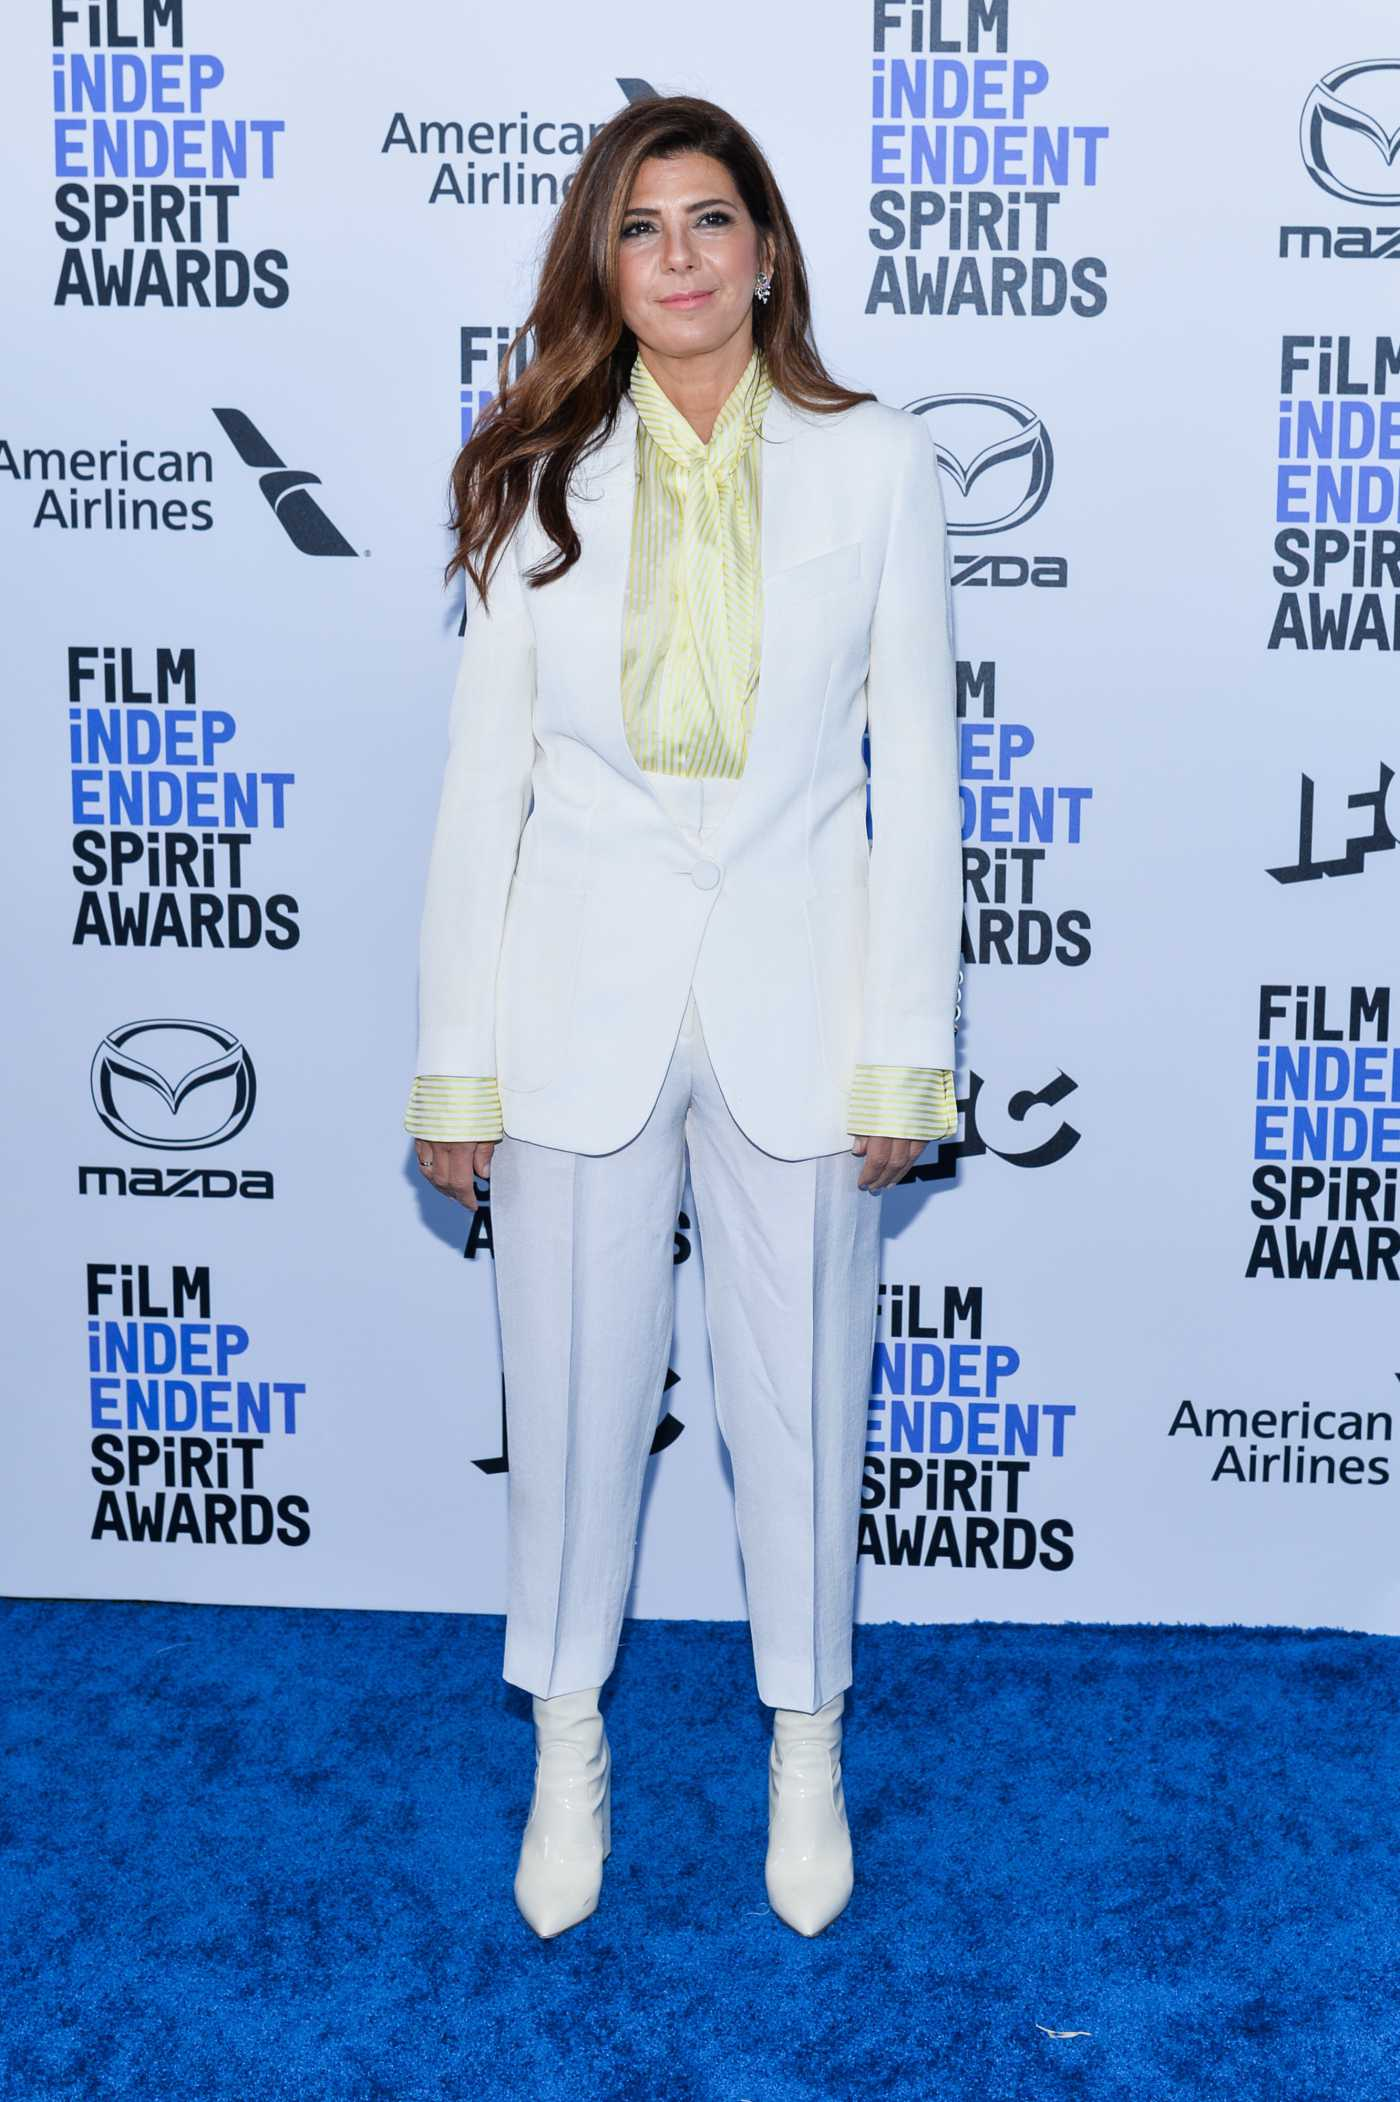 Marisa Tomei Attends 2020 Film Independent Spirit Awards in Santa Monica 02/08/2020